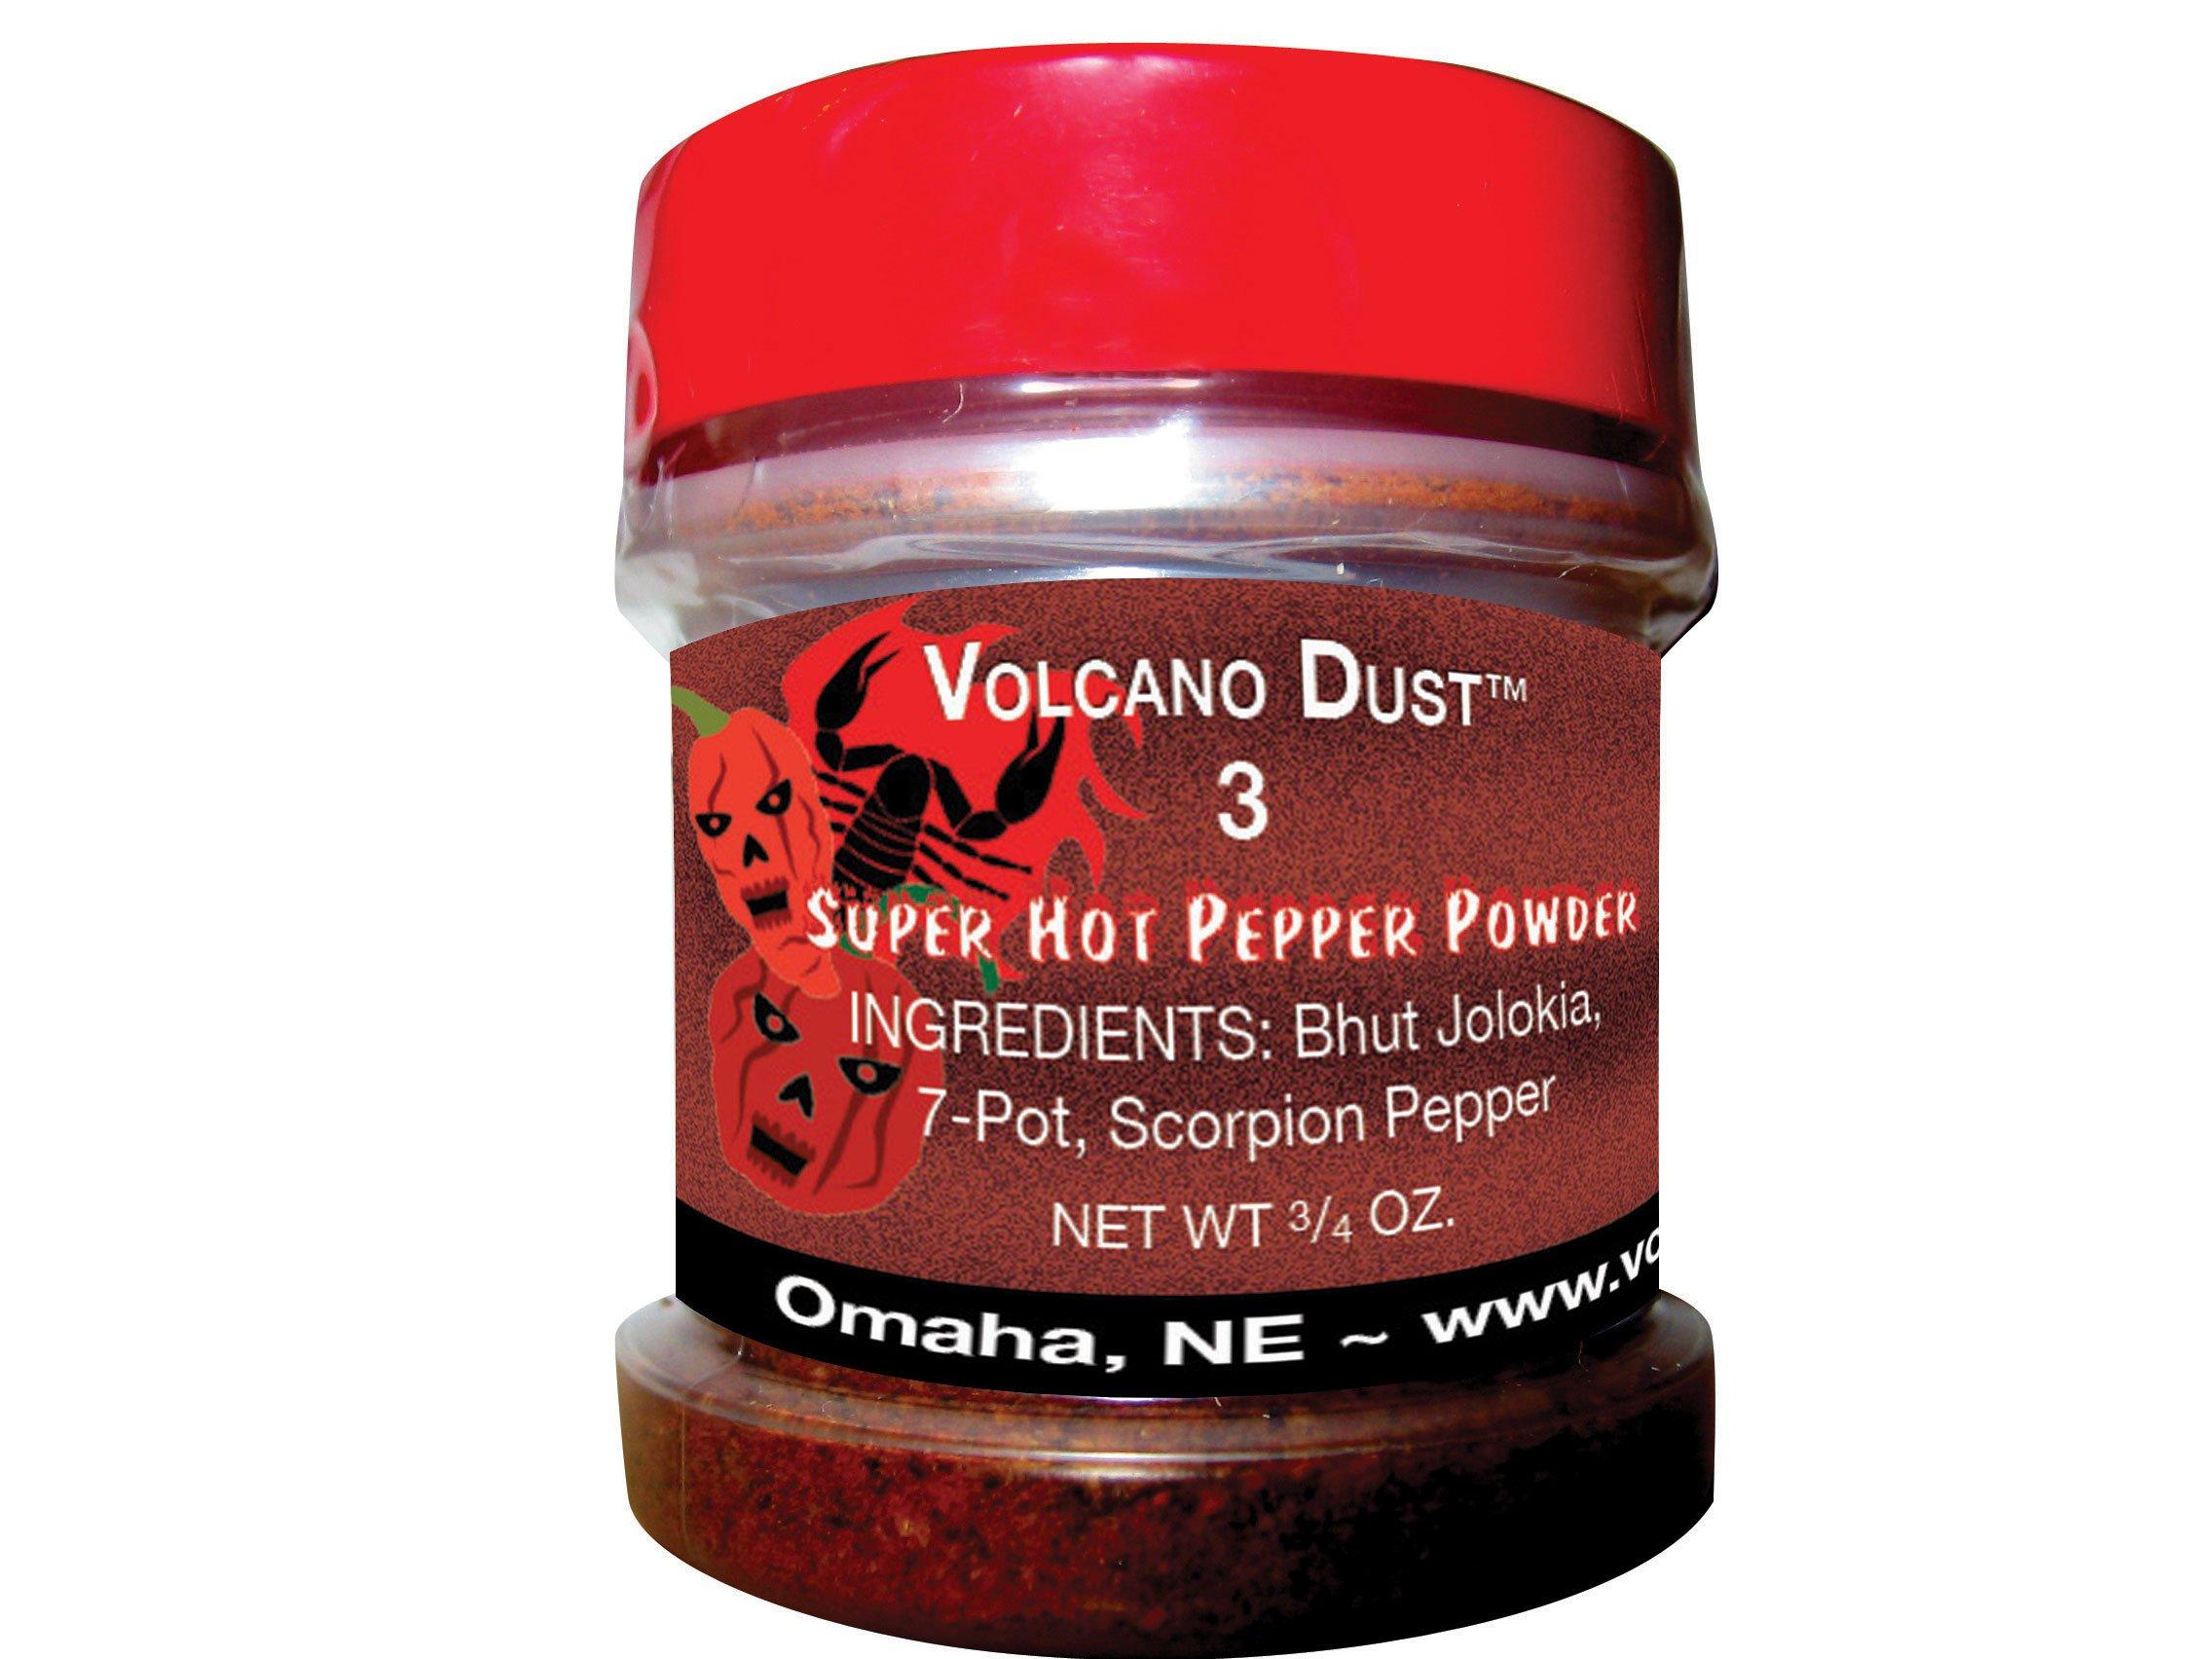 Volcano Dust 3 - Smoked Bhut Jolokia (Ghost), 7 Pot and Scorpion Pepper Powder - Super Hot